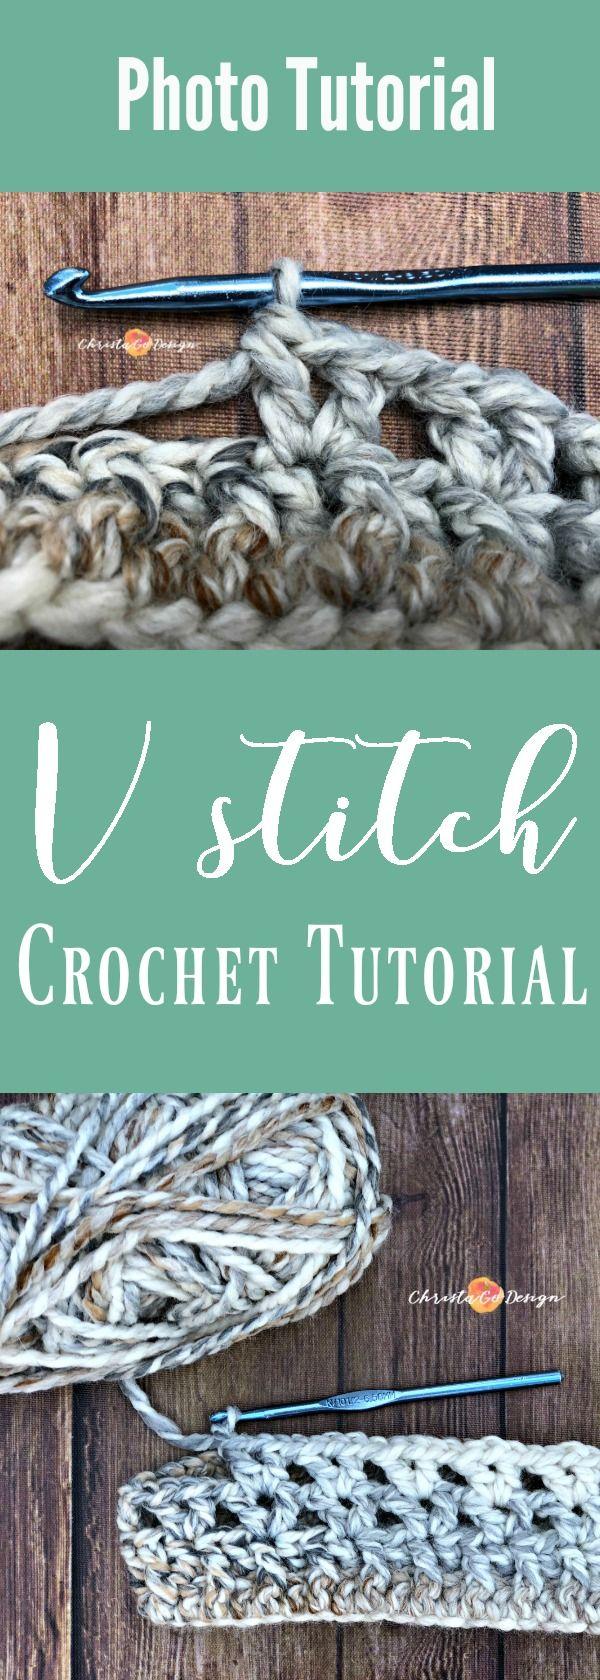 376 best Häkeln images on Pinterest | Crochet patterns, Crochet ...